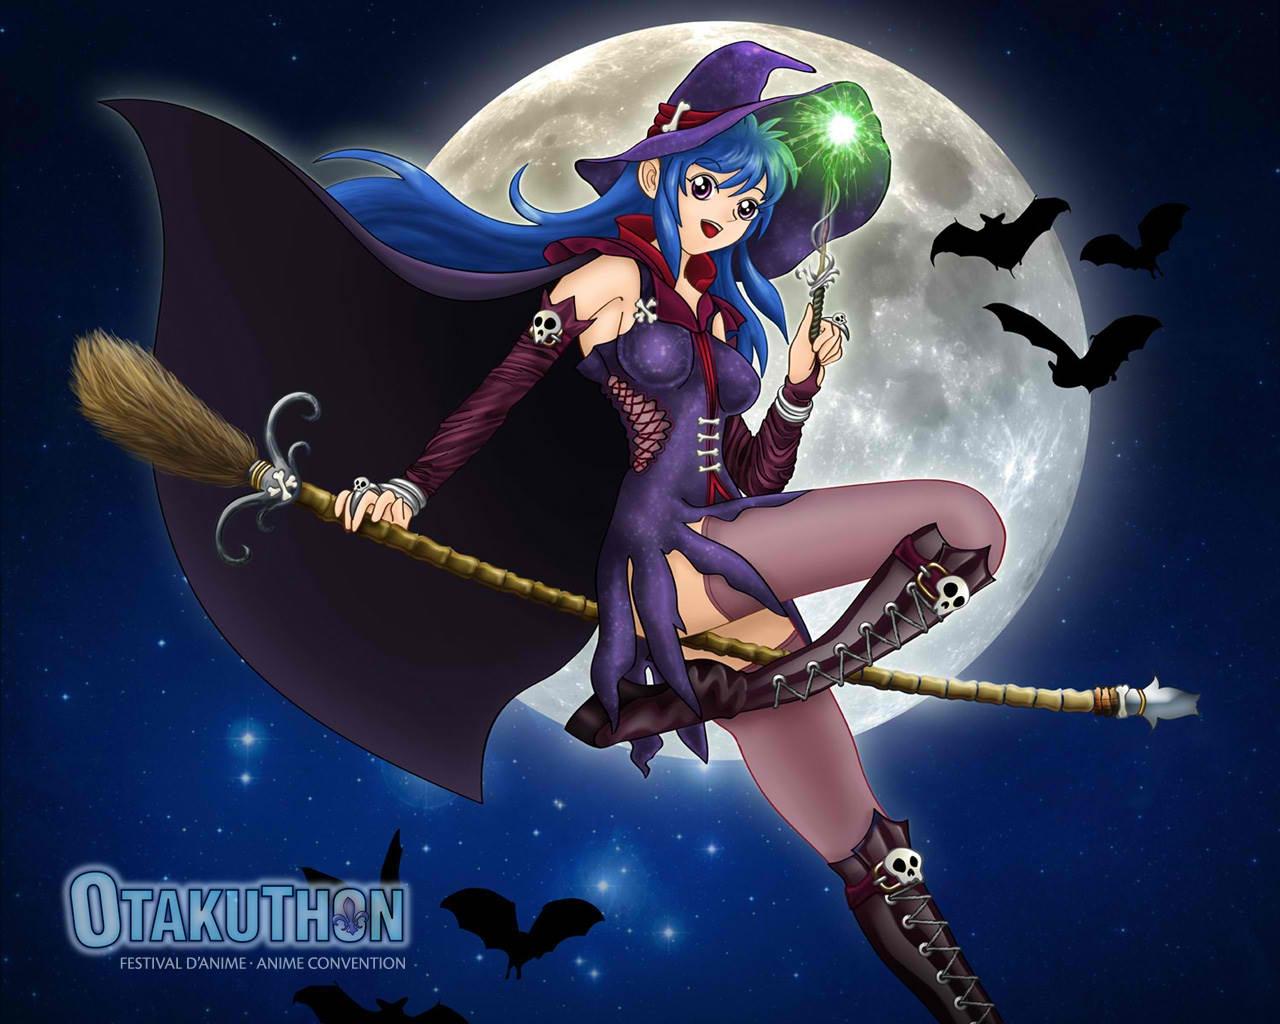 1500 x 555 jpeg 220kB, Portadas para Facebook - Halloween Anime Bruja ...: videodipornogratis.com/tag/imagenes-anime-halloween